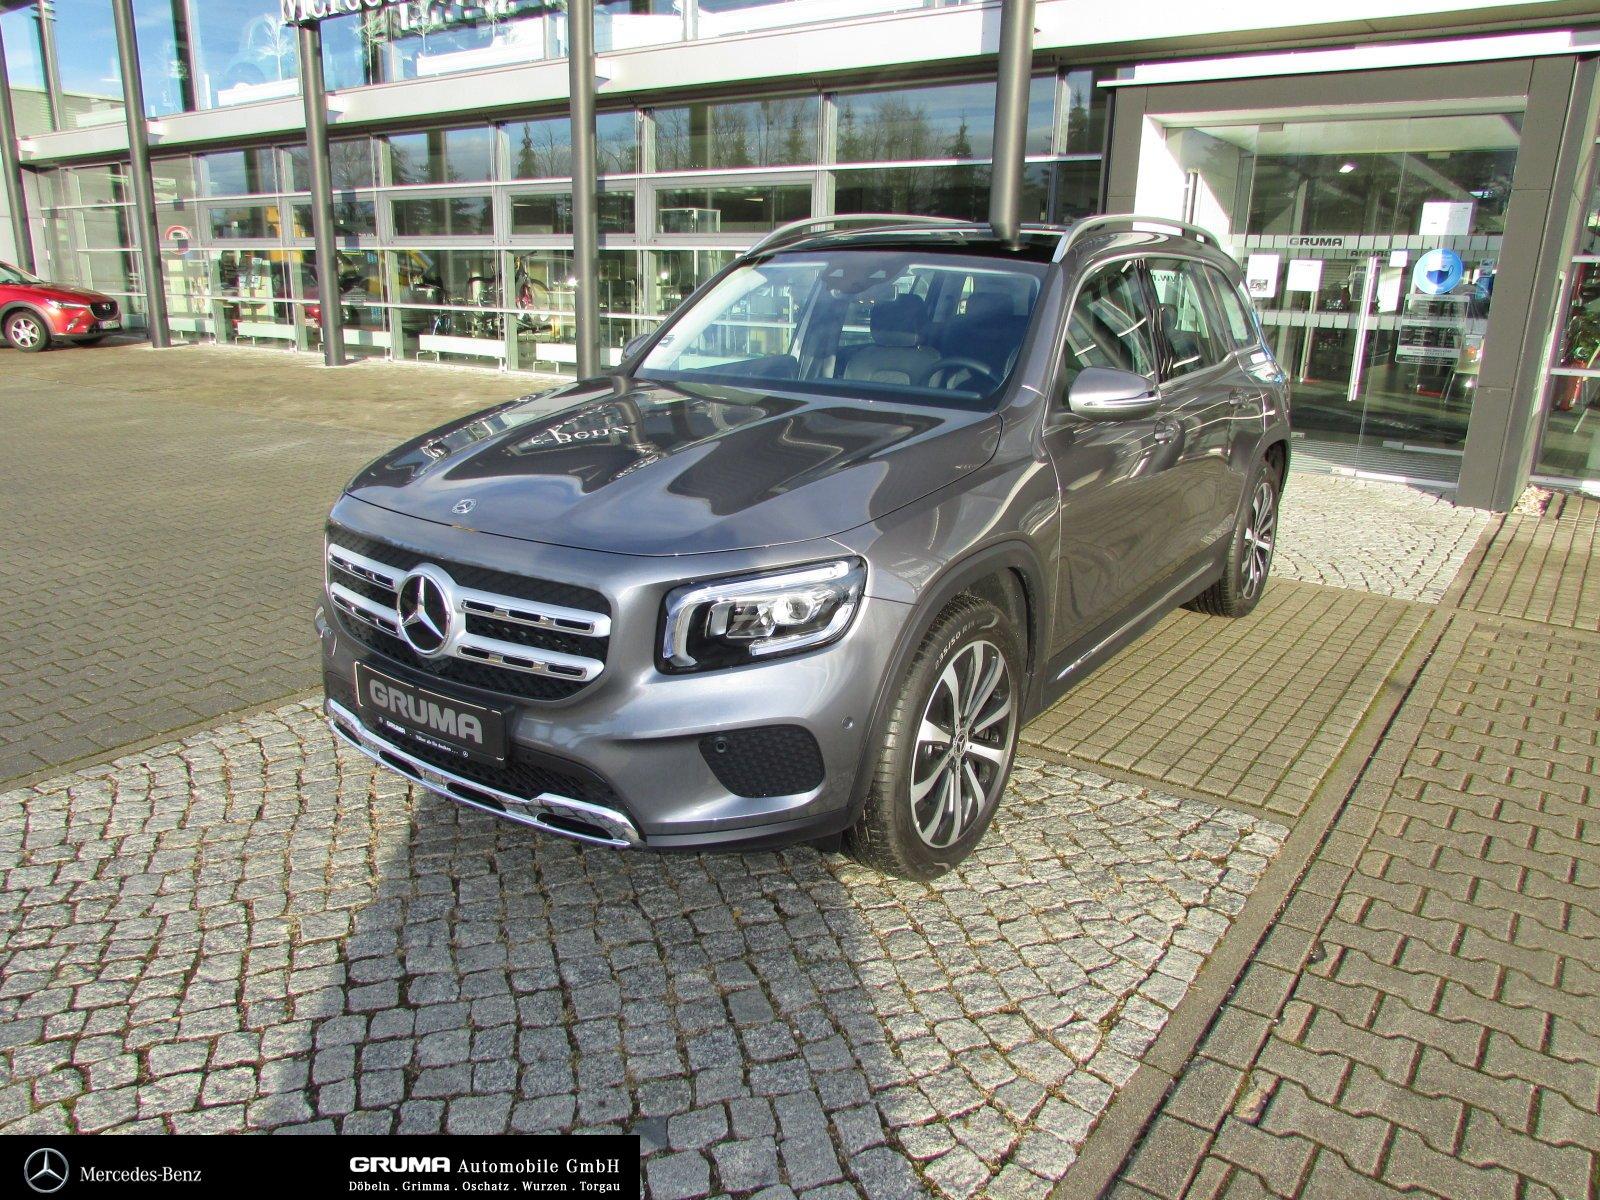 Mercedes-Benz GLB 180 d +BUSINESS+RÜKA+PANO+LED+EASY-PACK+ BC, Jahr 2020, Diesel